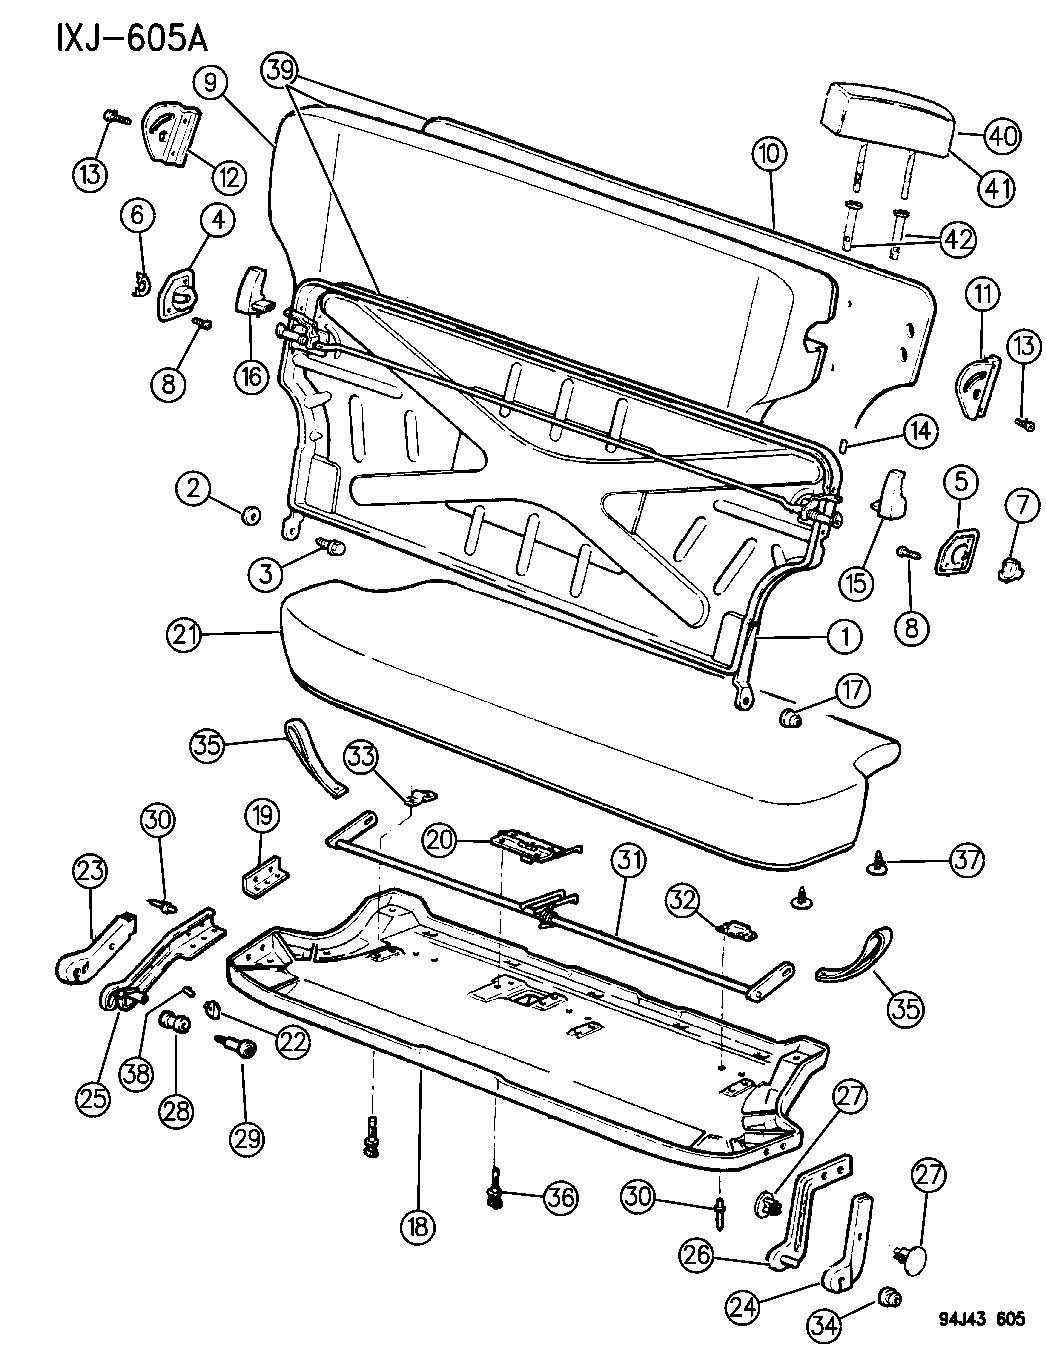 Jeep Grand Cherokee Cylinder. Headrest. With latch. Trim